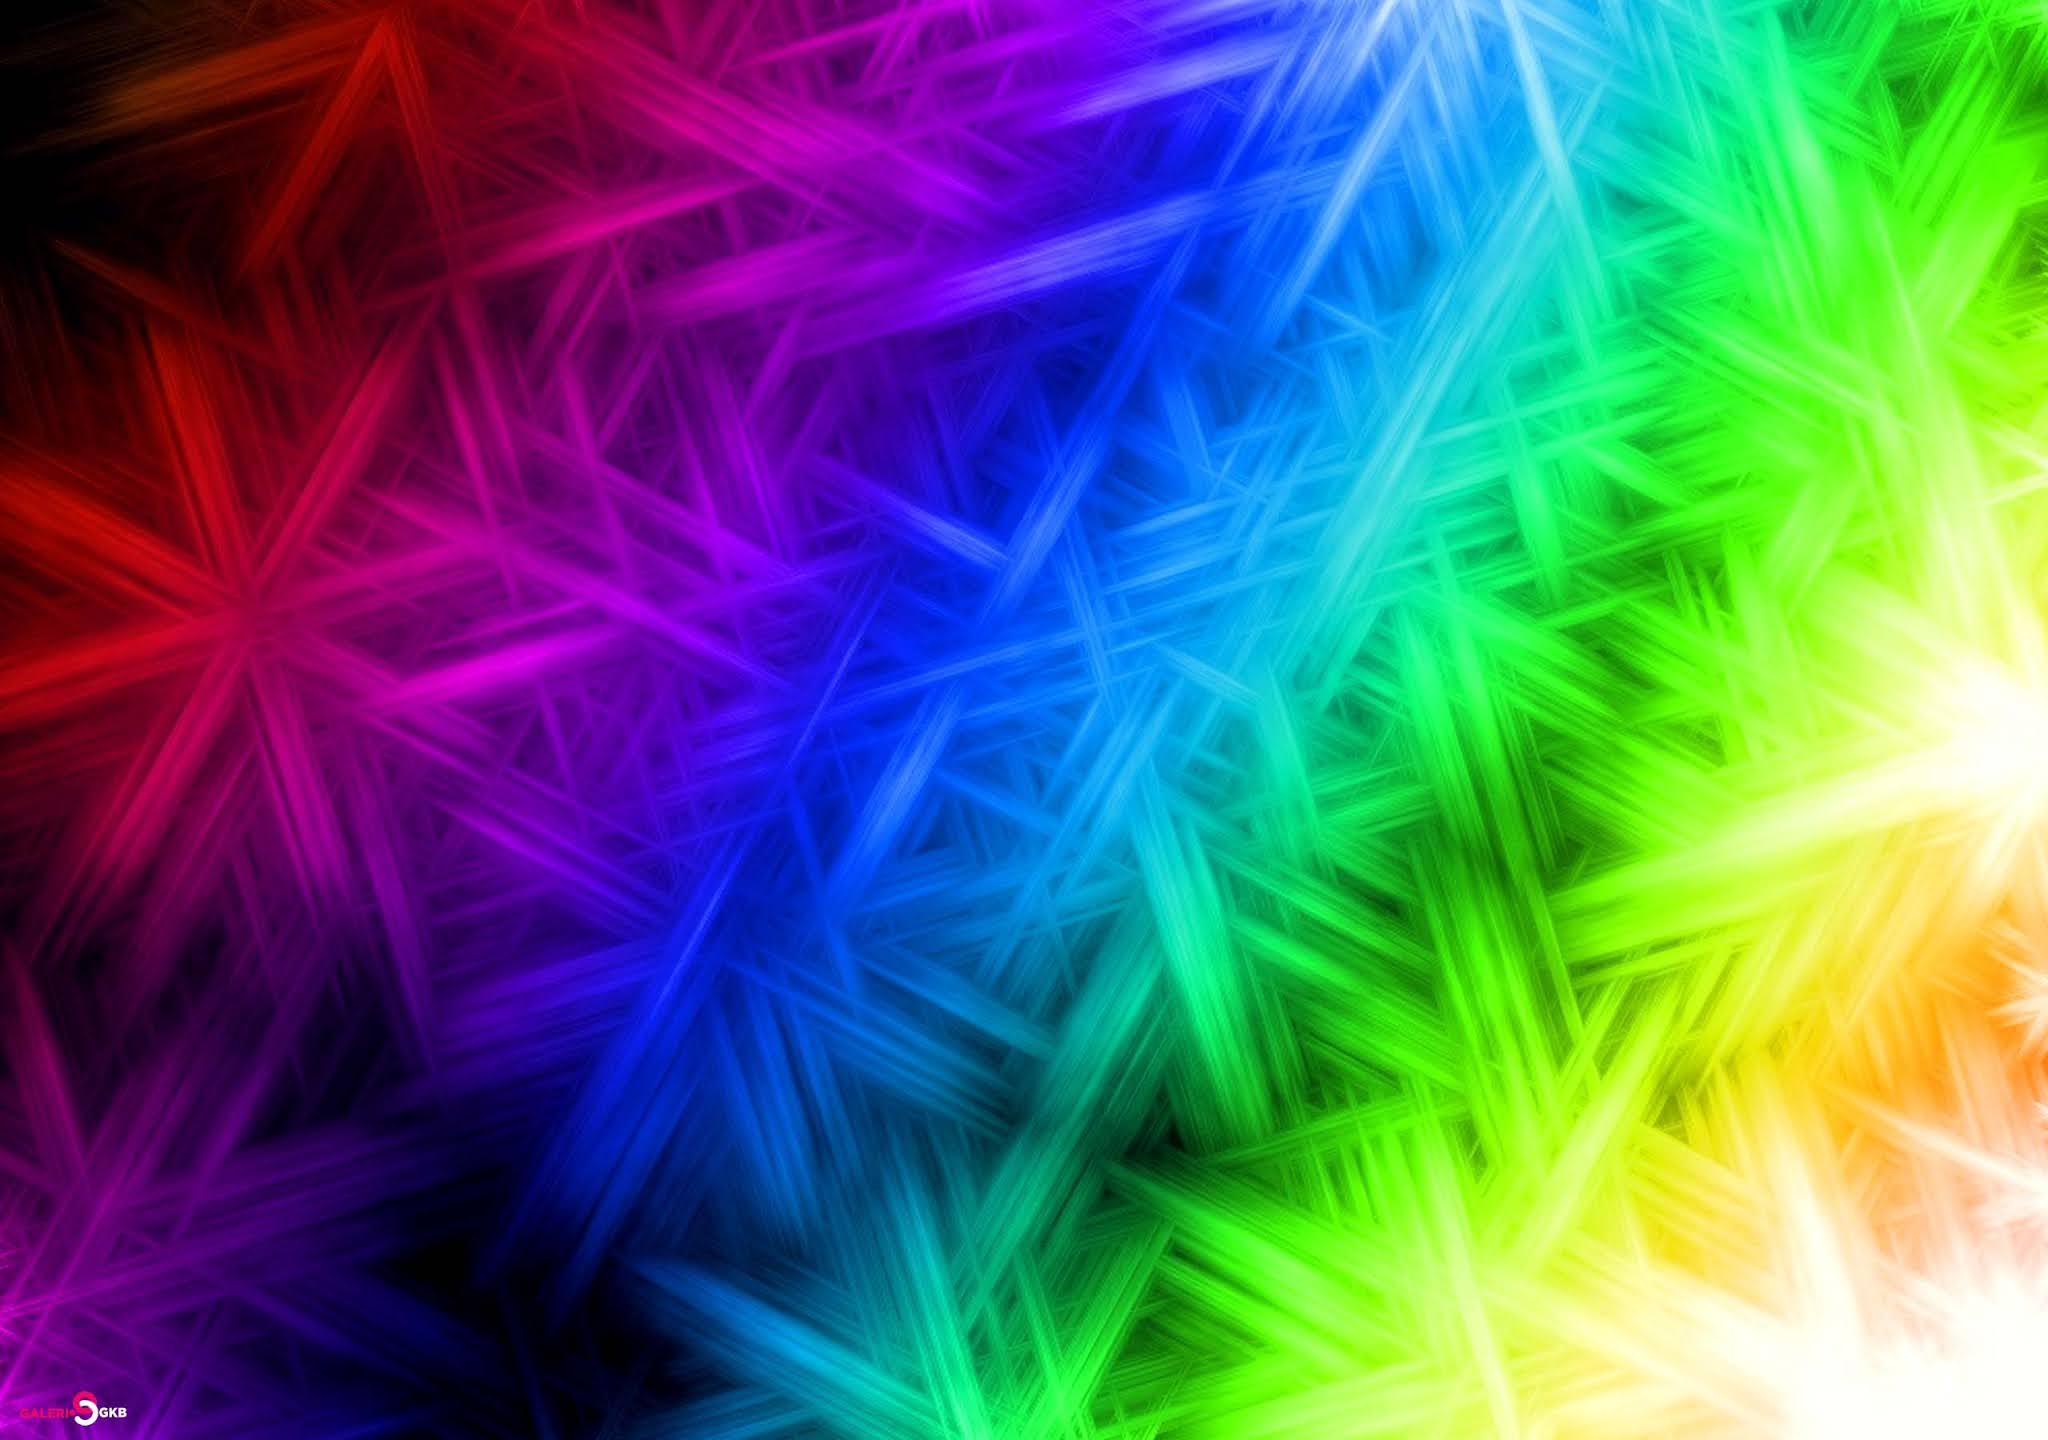 25 Abstract Pattern Cool Wallpaper Ultra HD 4K For Desktop PC